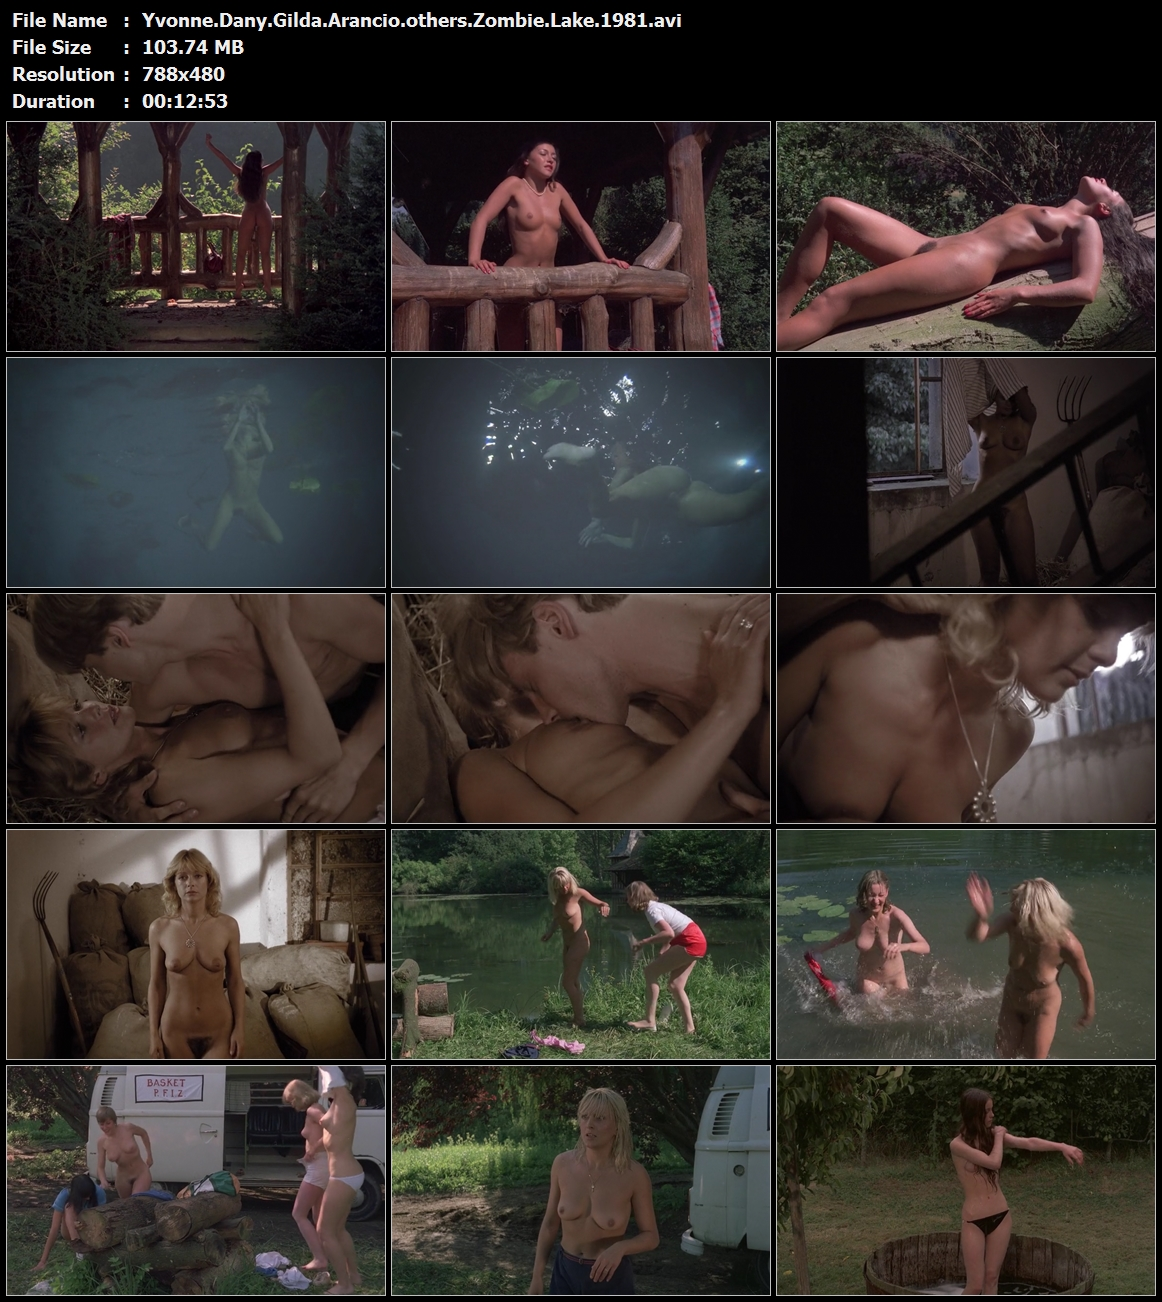 Yvonne.Dany.Gilda.Arancio.others.Zombie.Lake.1981.avi